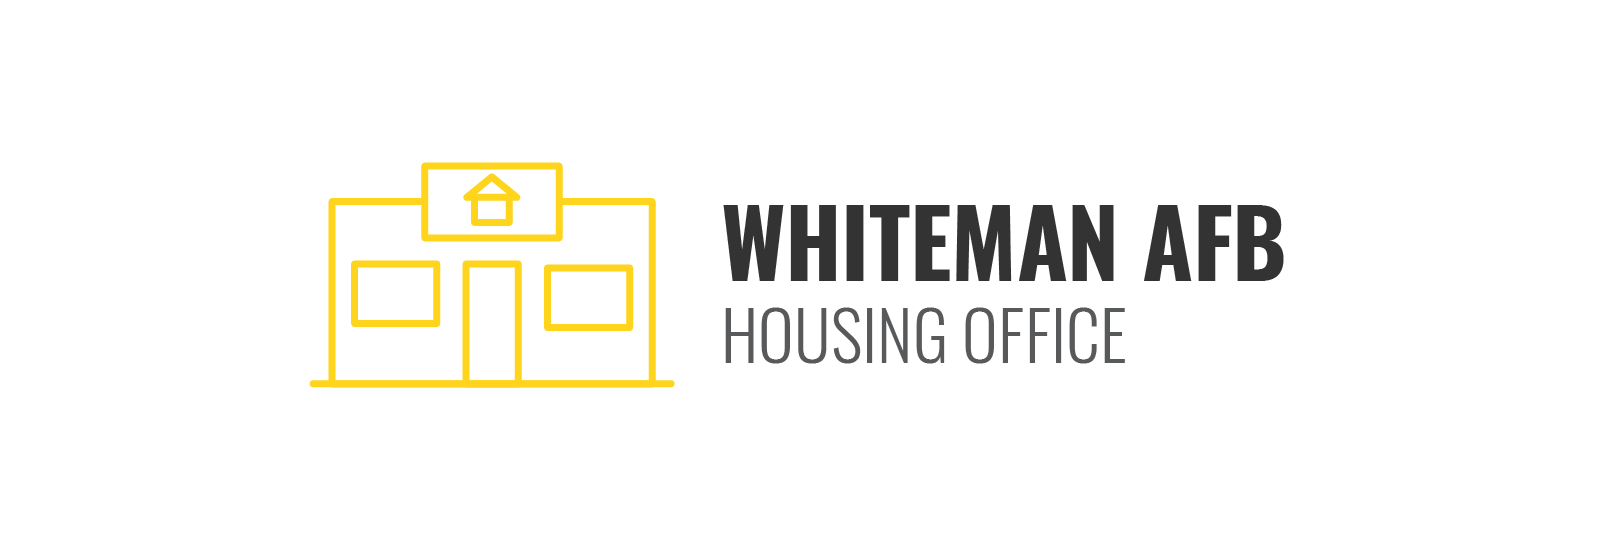 Whiteman AFB Housing Office